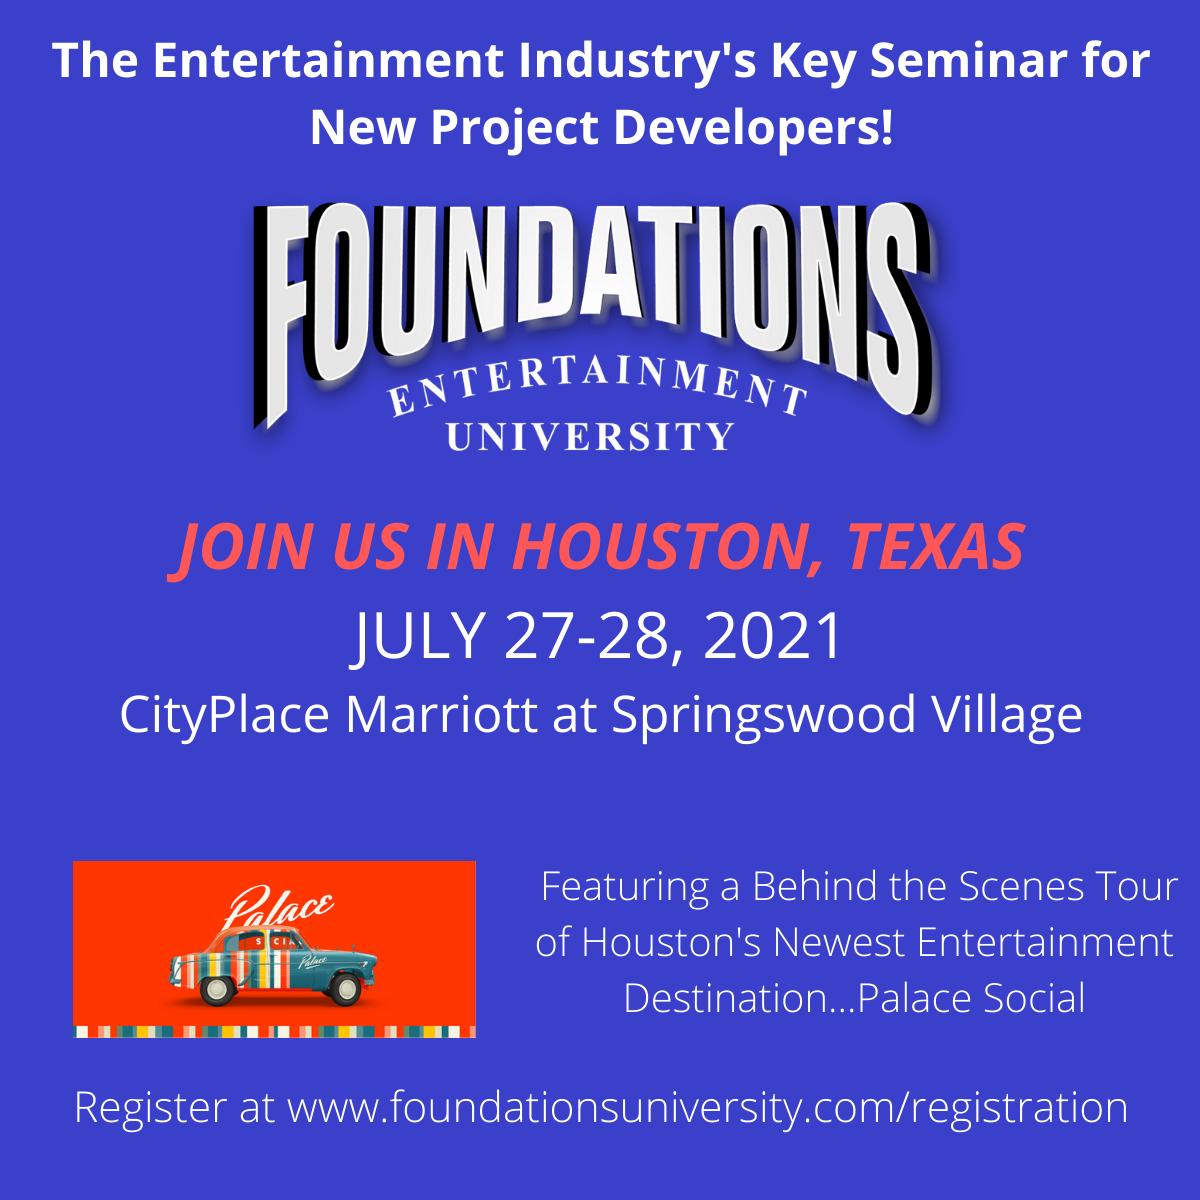 iPlayCO FEU Foundations Entertainment University FEC